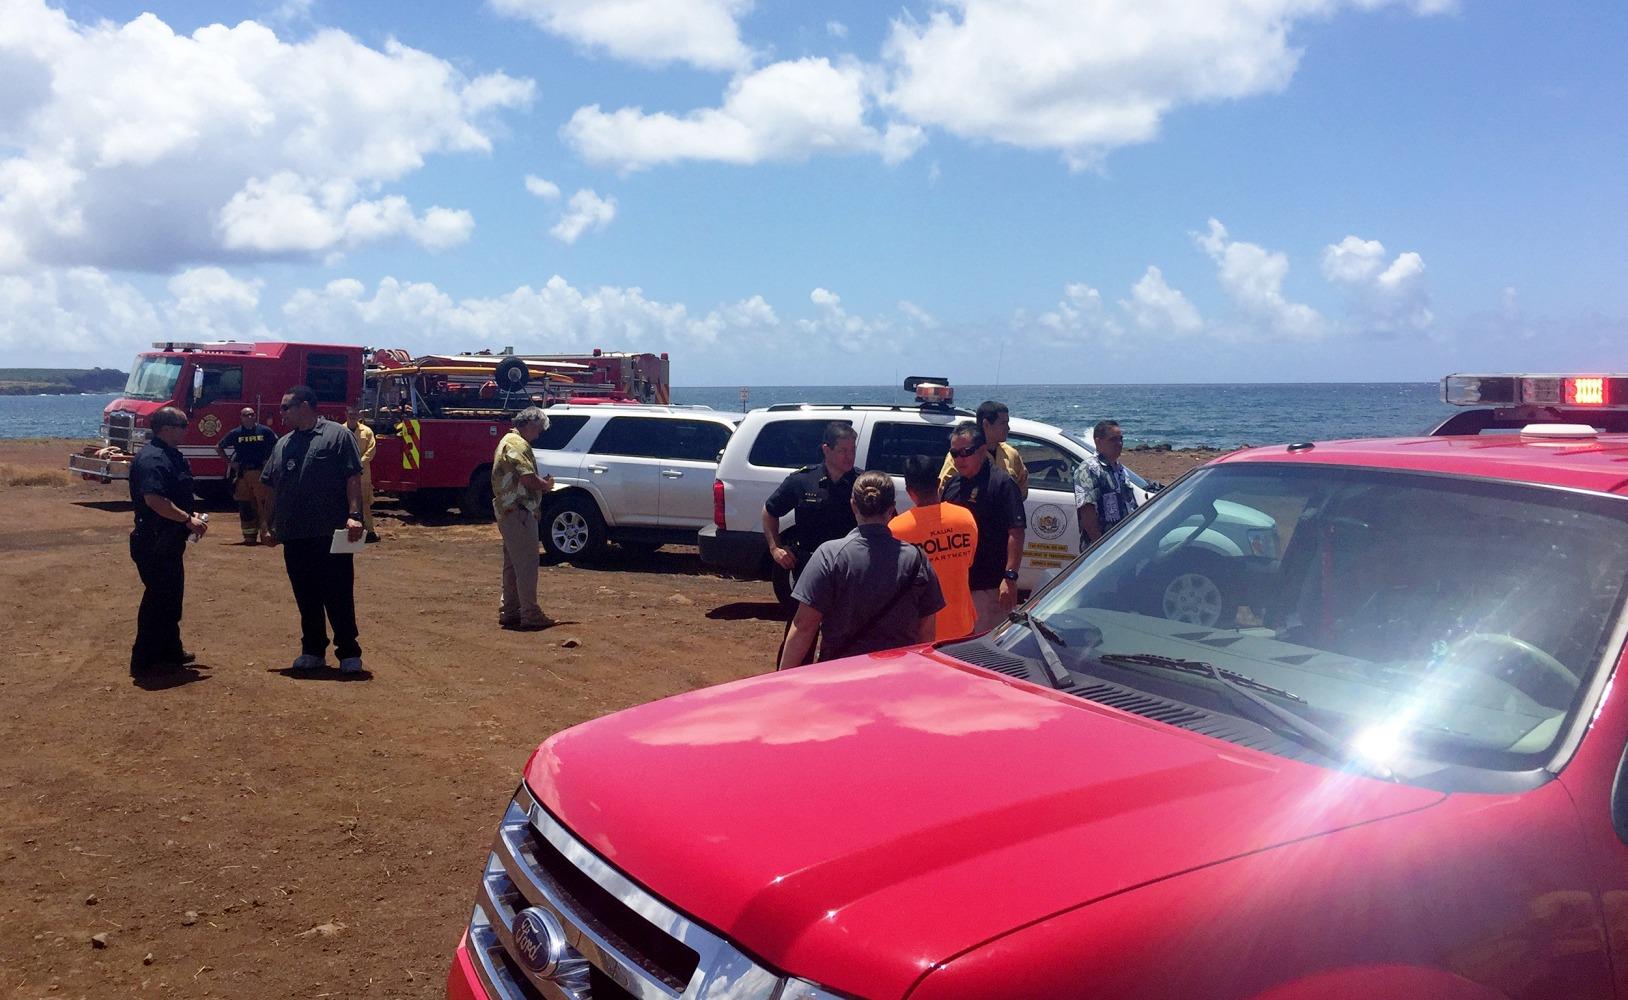 Skydiving plane crashes in hawaii killing five nbc news for Department of motor vehicles kauai